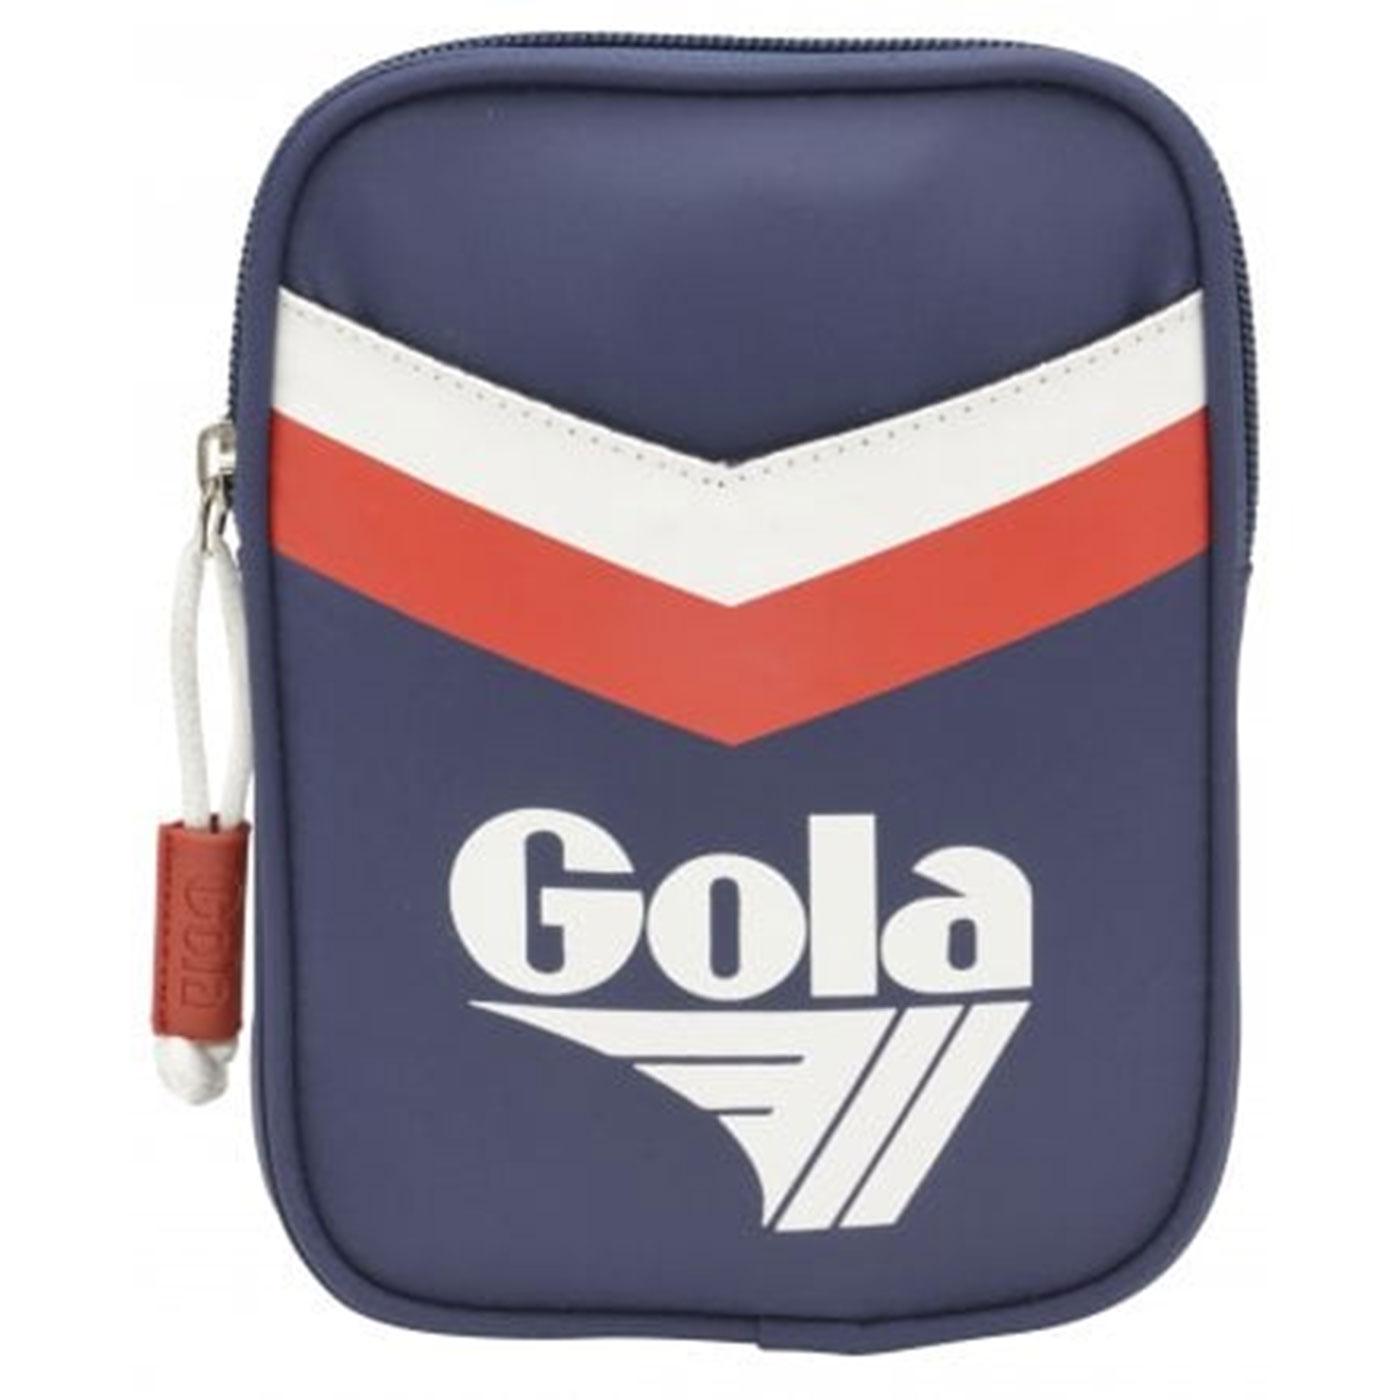 Goodman Chevron GOLA Retro Micro Pocket Bag (N/R)